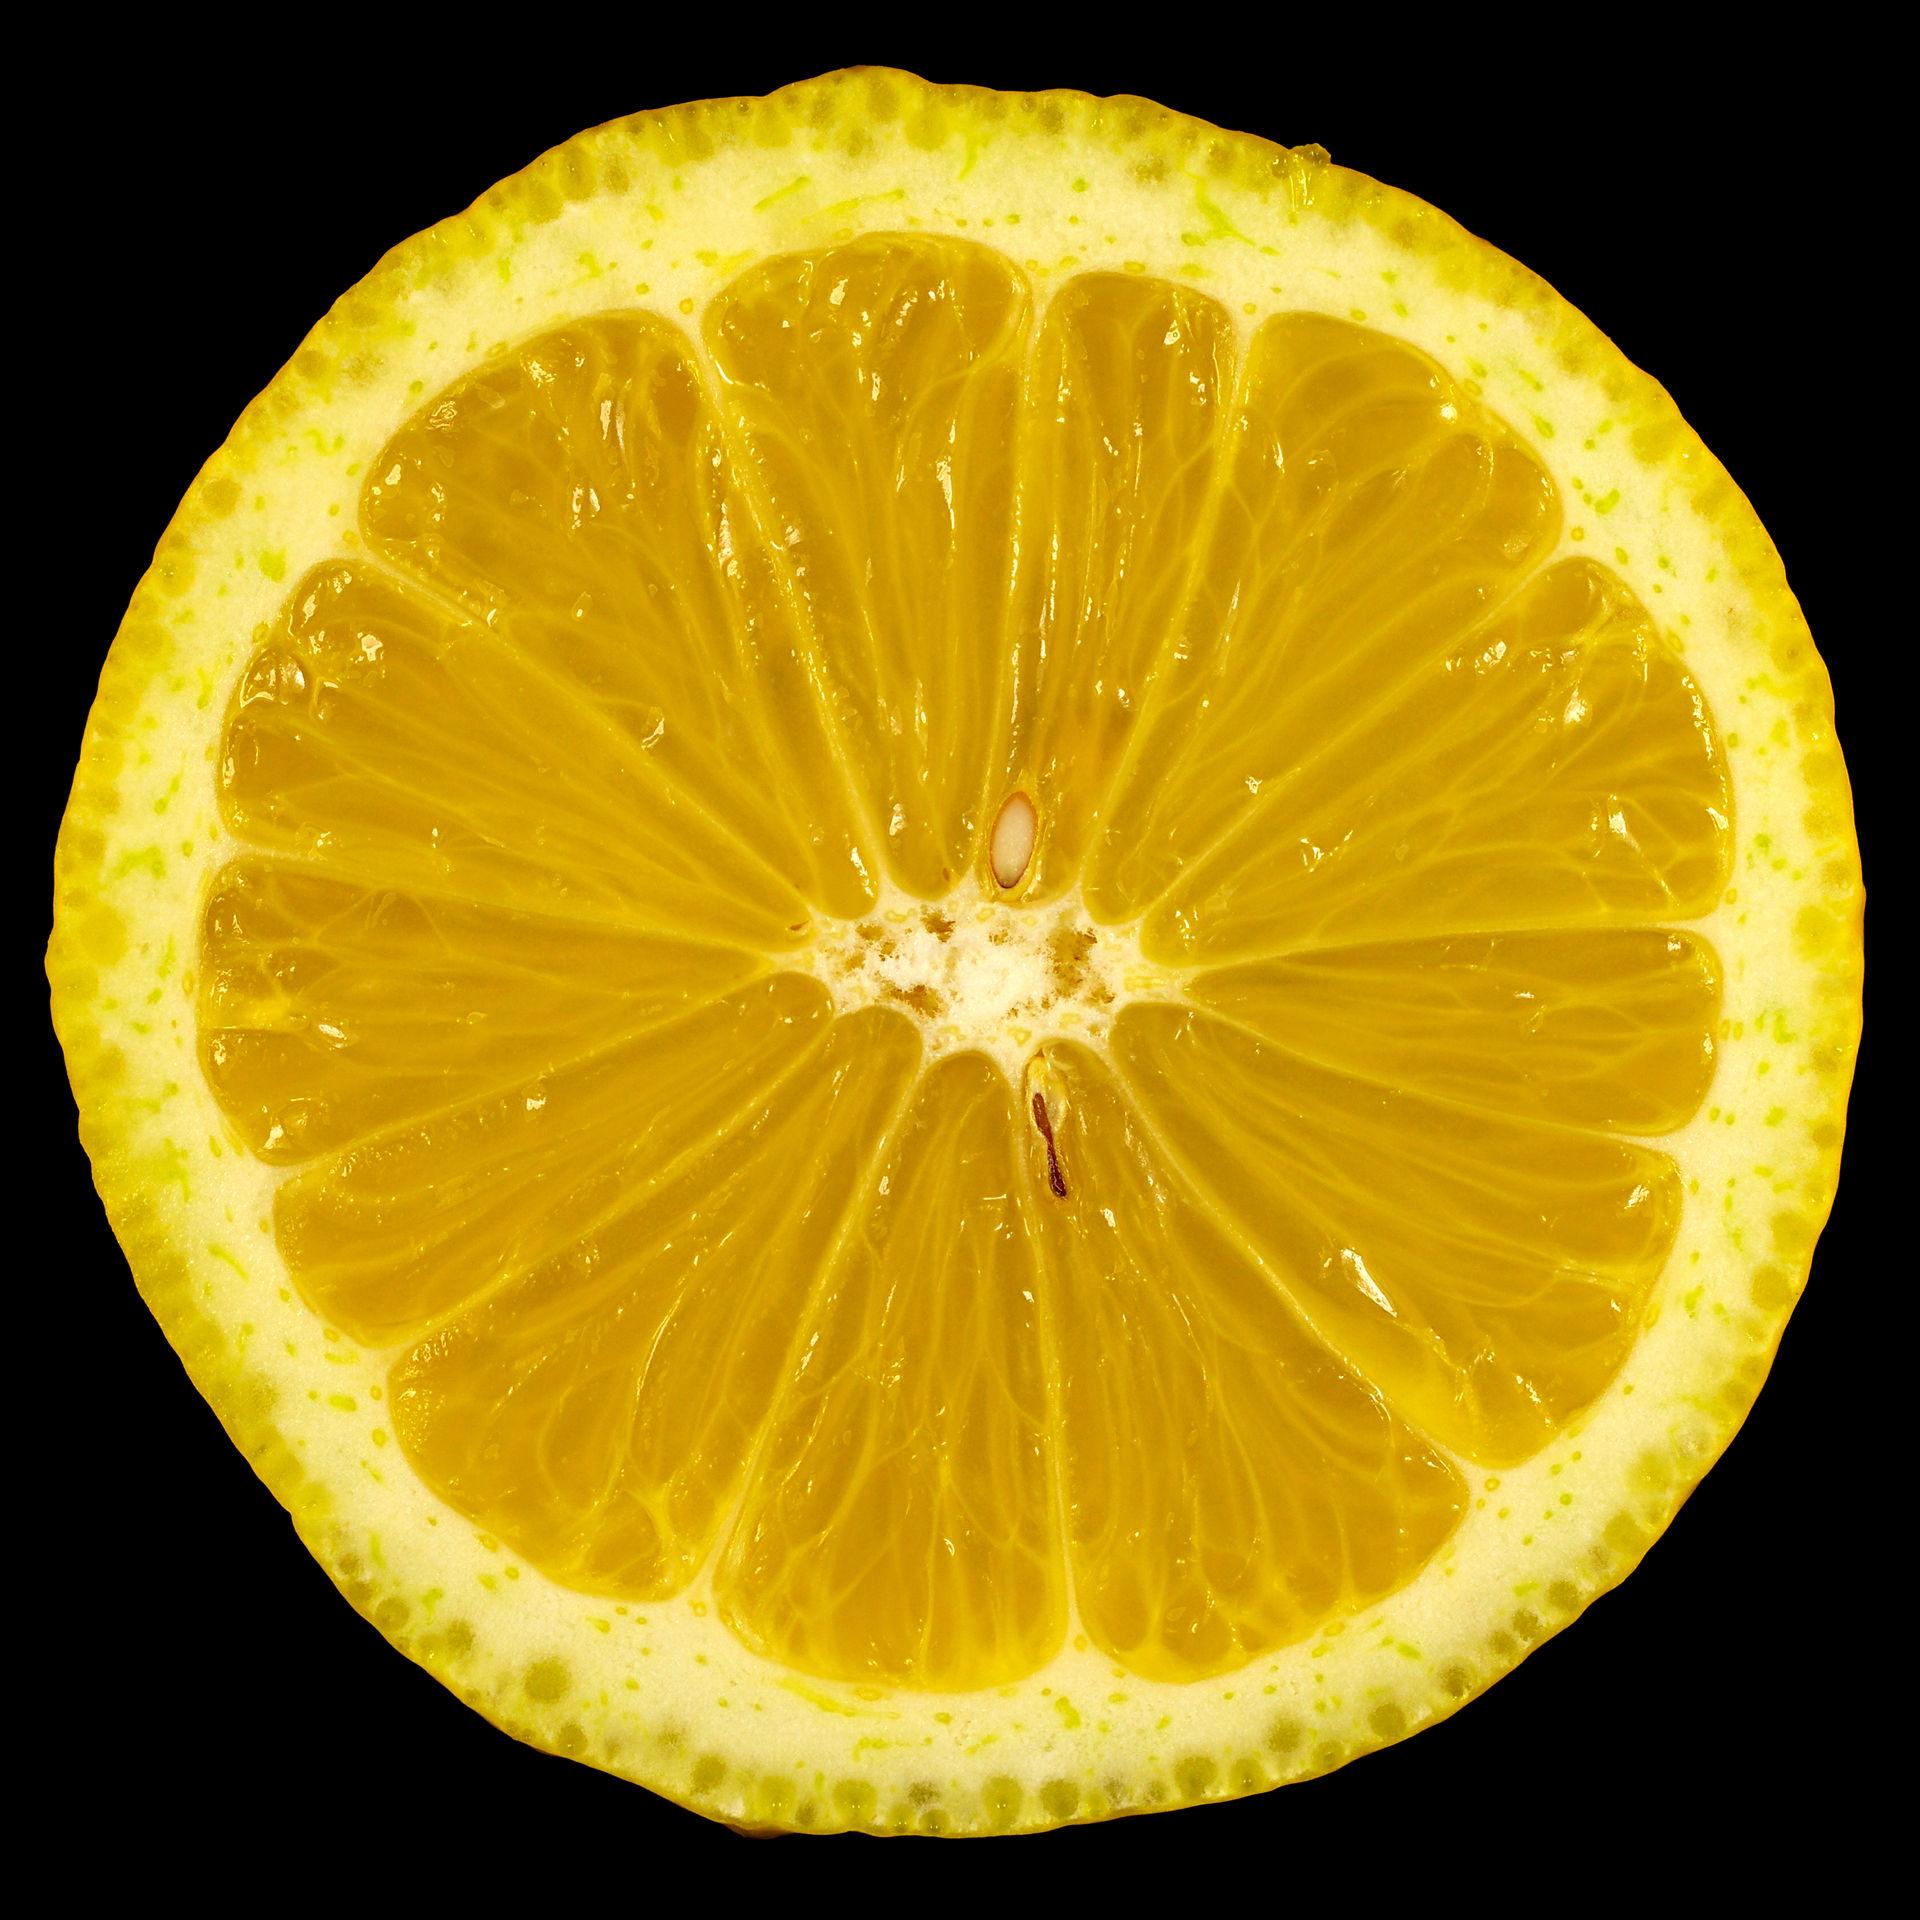 die buntlaubige zitrone citrus limon foliis variegatis flora obscura. Black Bedroom Furniture Sets. Home Design Ideas